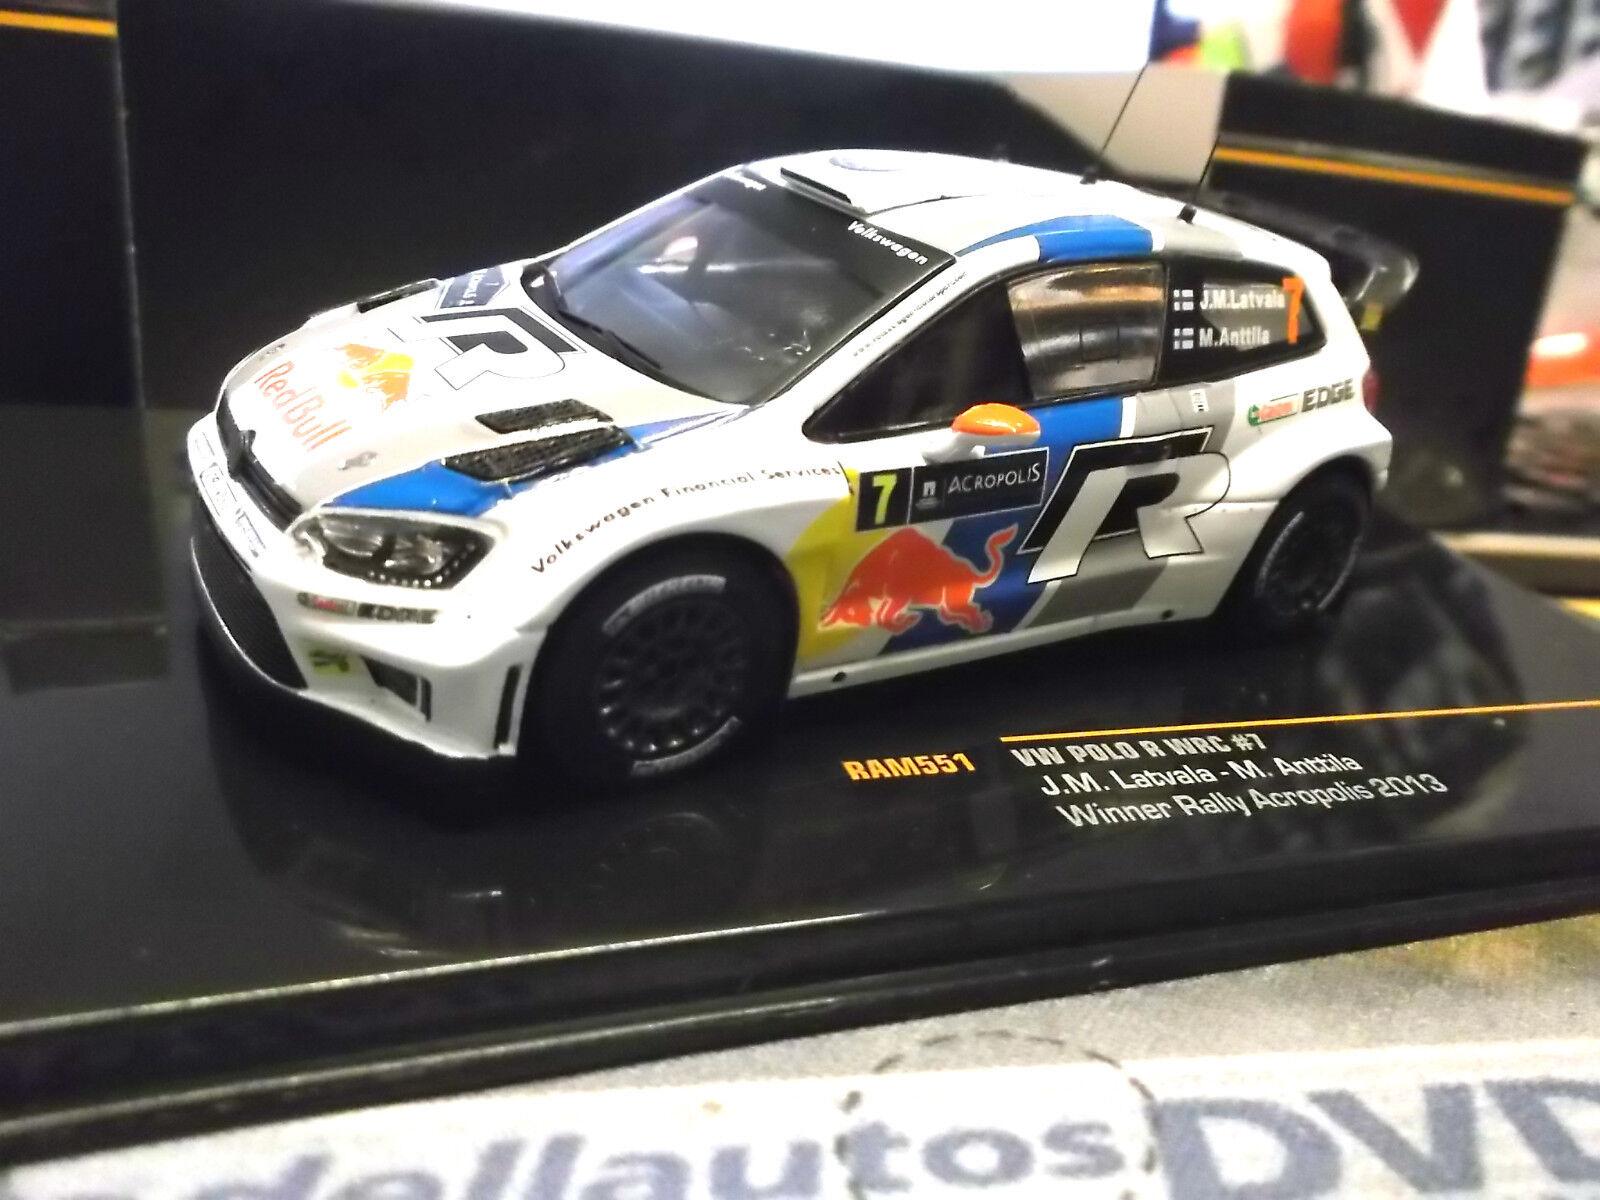 VW Volkswagen Polo WRC Rallye Acropole Latvala Win 2013 R Bull RAM551 IXO 1 43